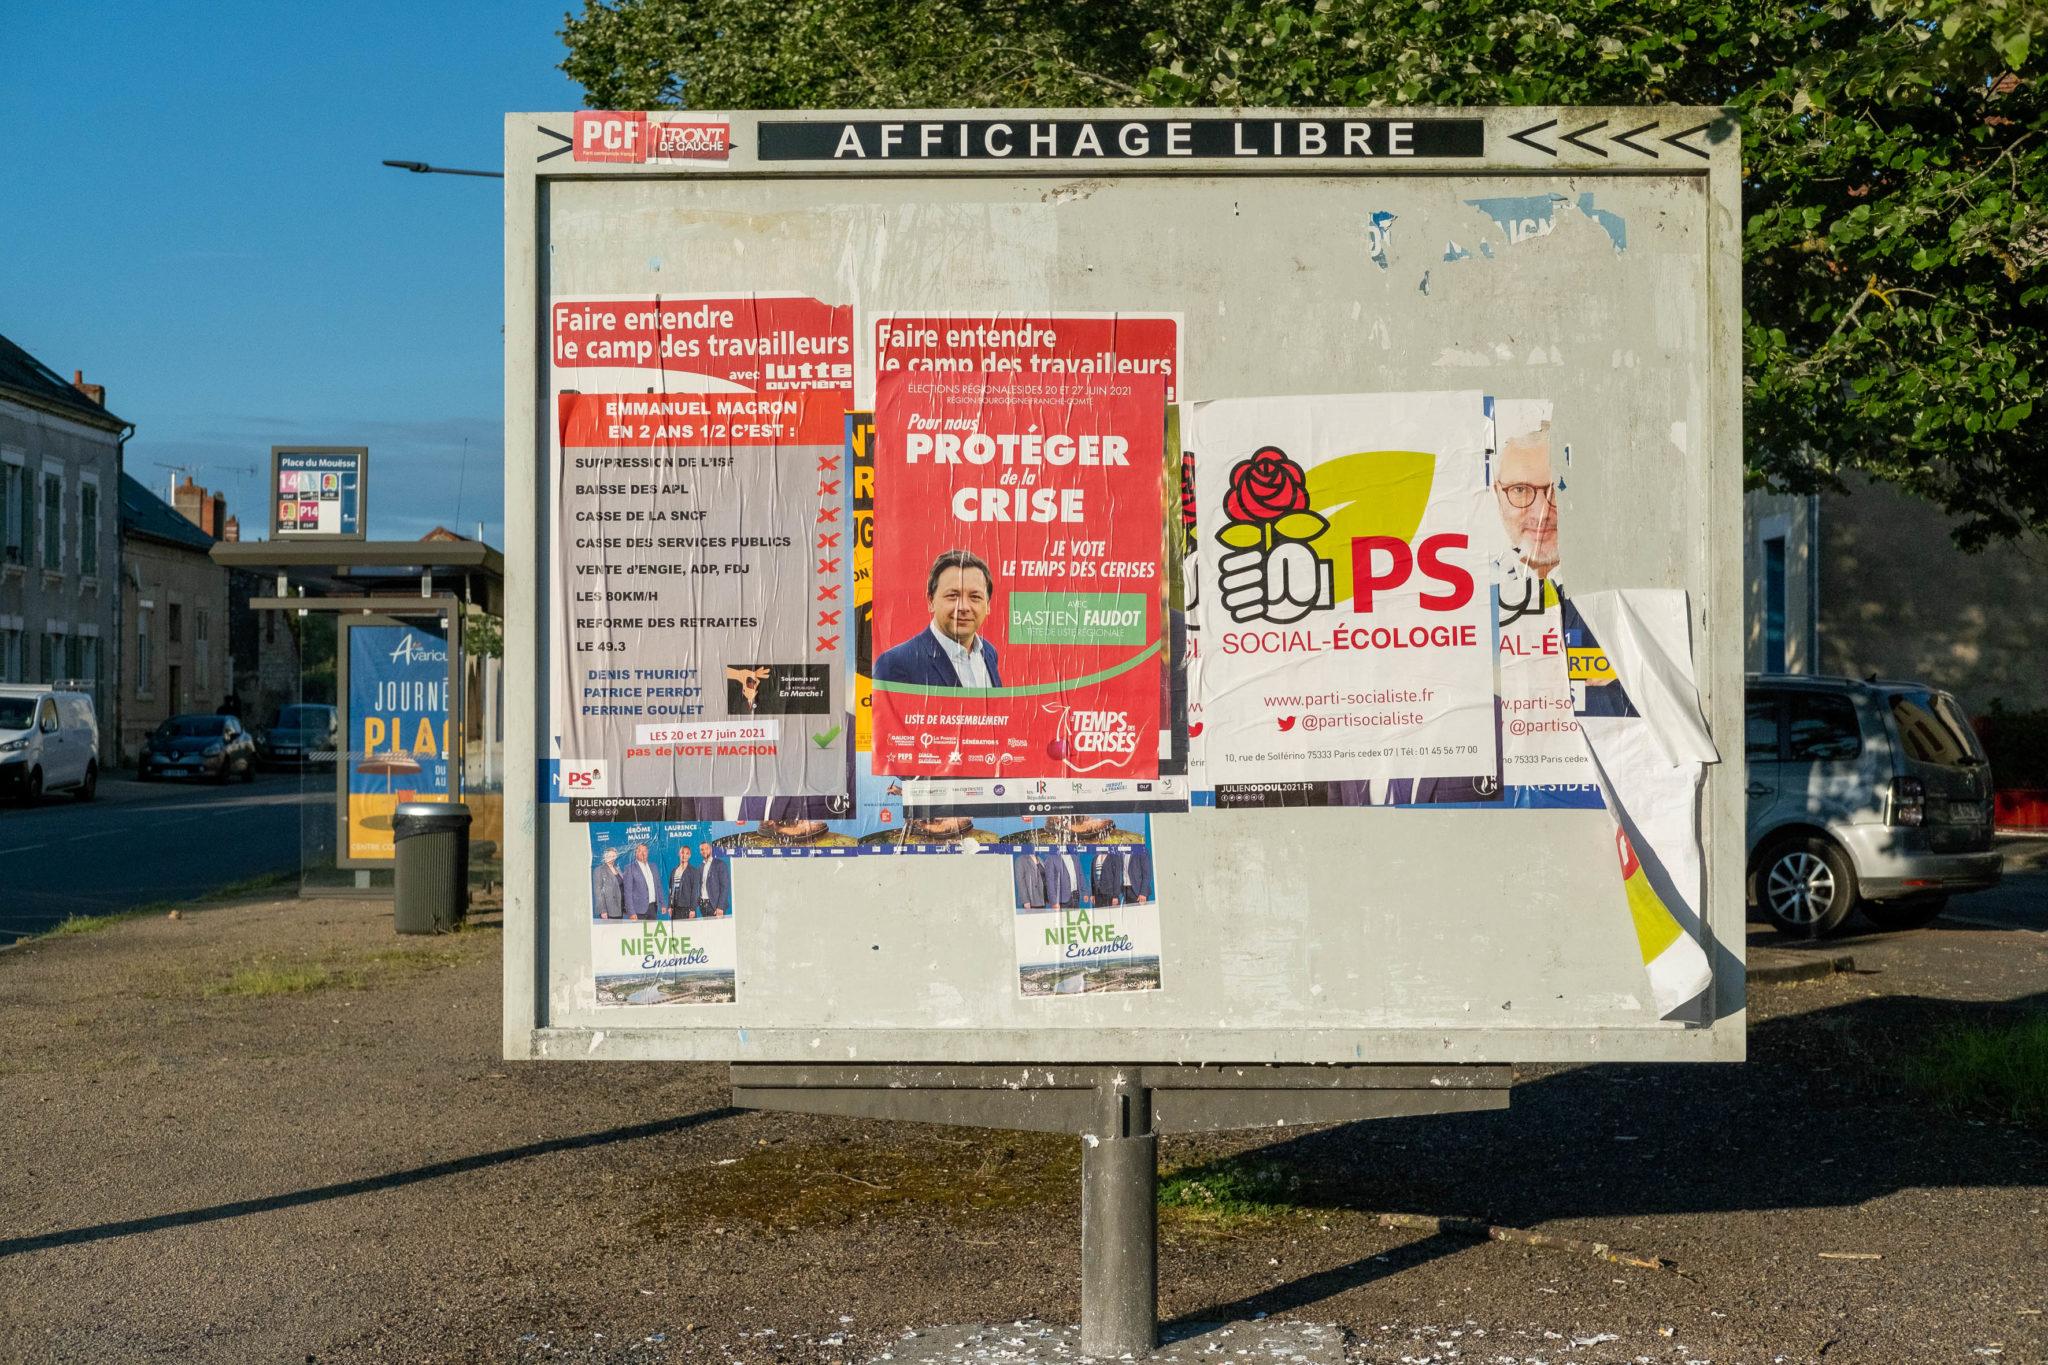 FRANCE, NEVERS, 2021/06/07. Election billboards in the streets of Nevers. Florian Jannot-Caeillete / APJ / Hans Lucas.FRANCE, NEVERS, 2021/06/07. Panneaux d'affichage électoraux dans les rues de Nevers. Florian Jannot-Caeillete / APJ / Hans Lucas.